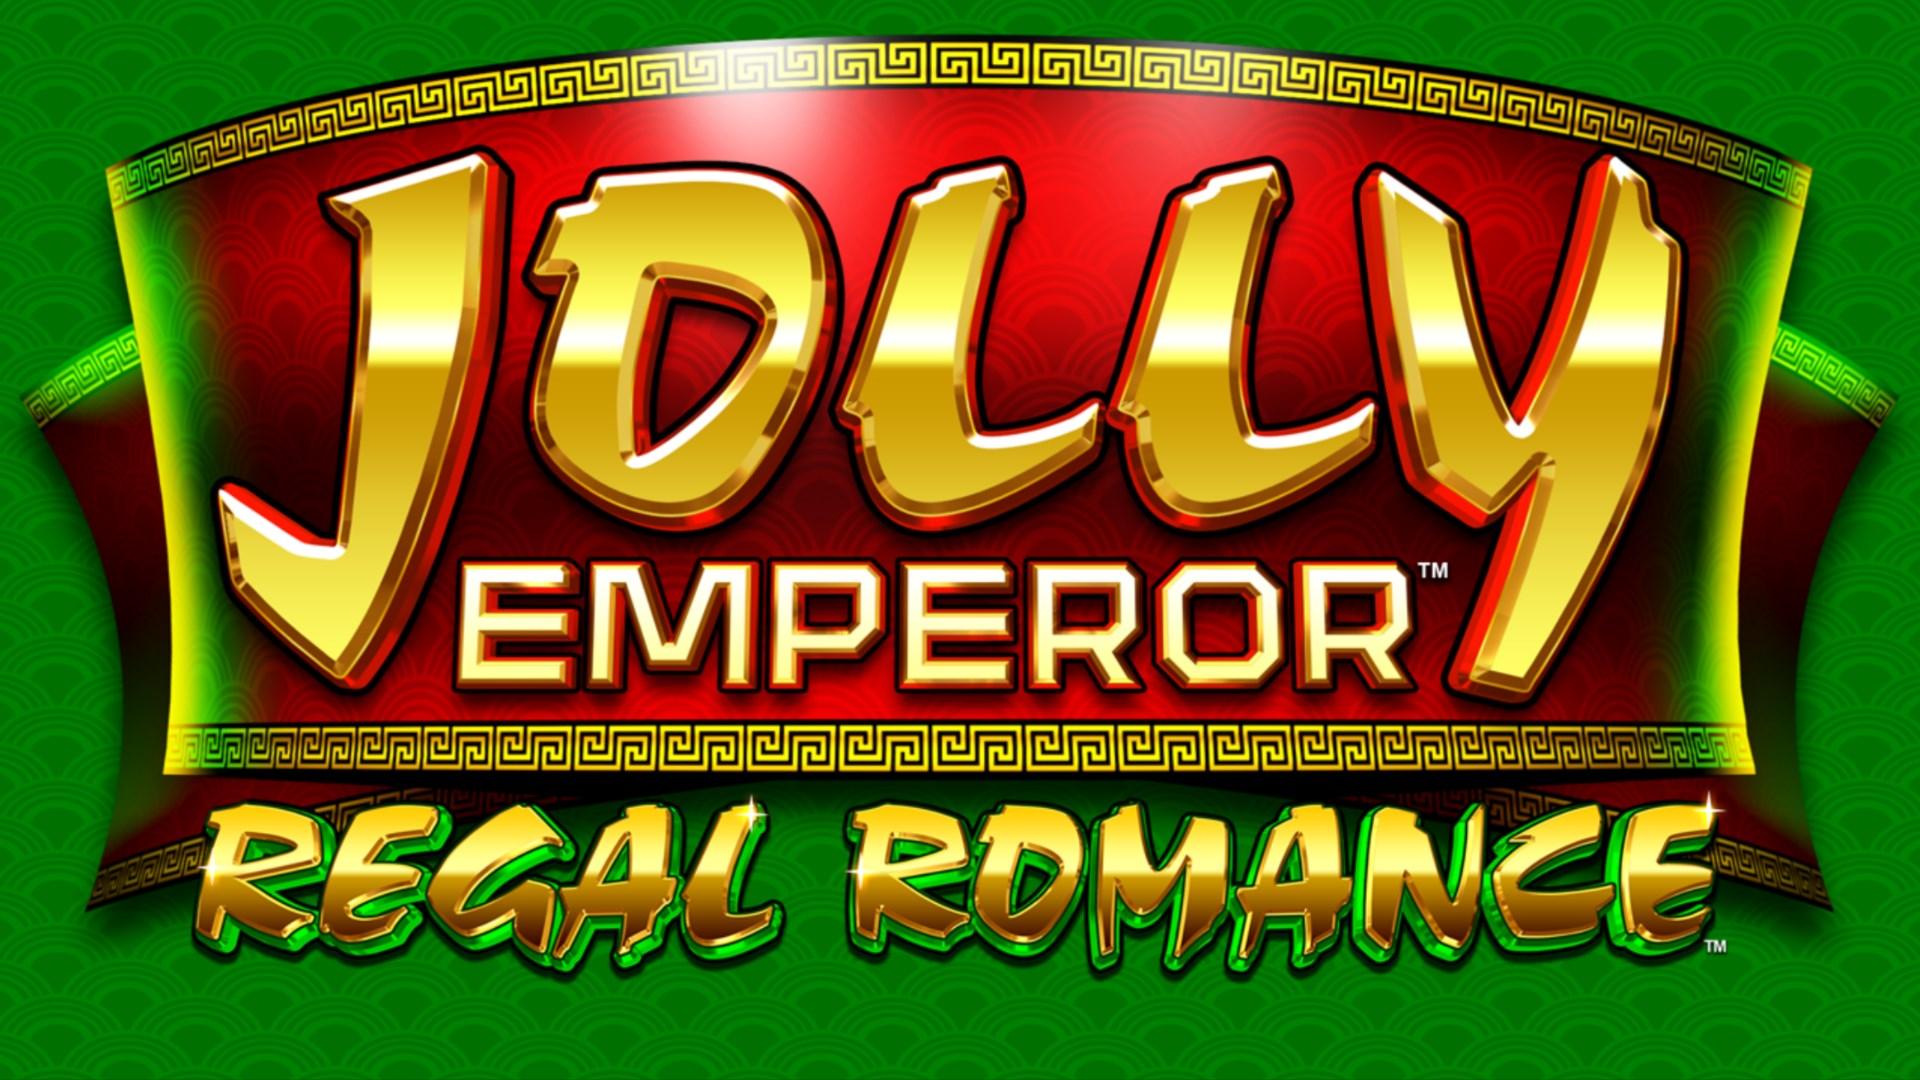 JollyEmperorRomance_TopArt_4MKT.jpg